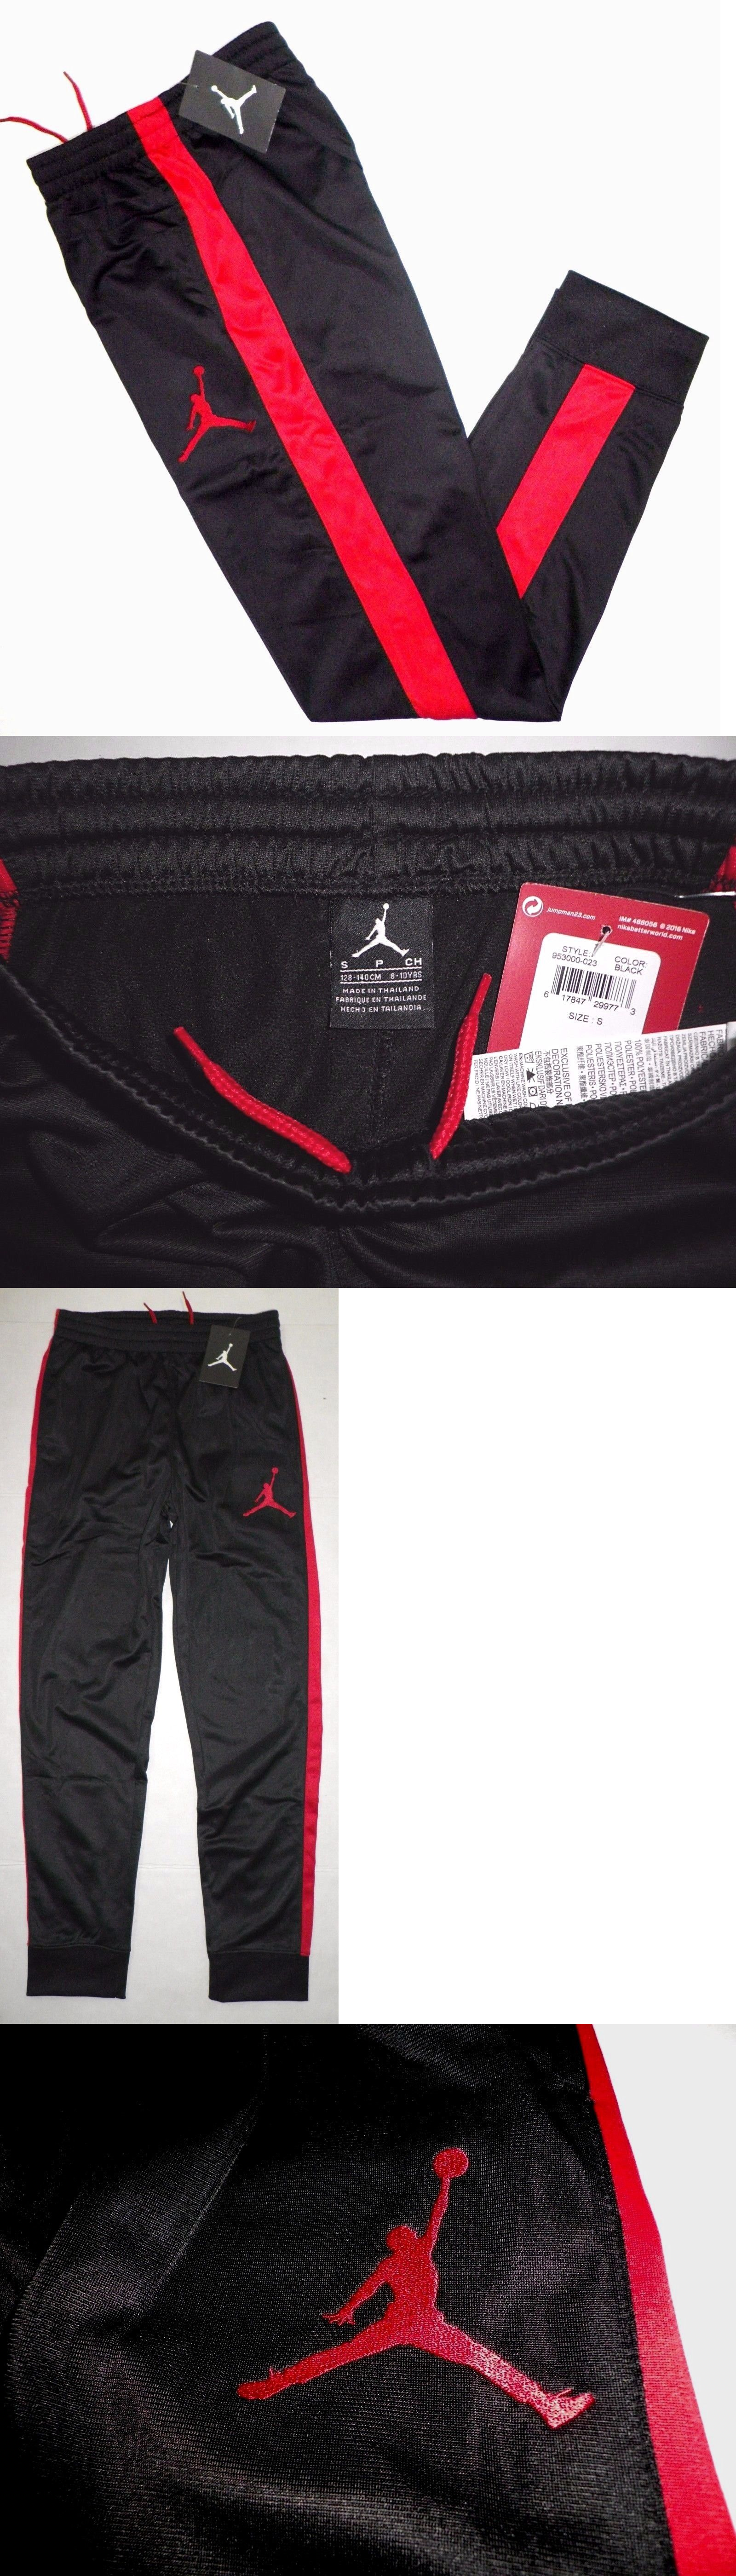 f9aef29468e ... canada pants 51920 nike air jordan boys jumpman athletic jogger sweat  pants black red y s 8 ...